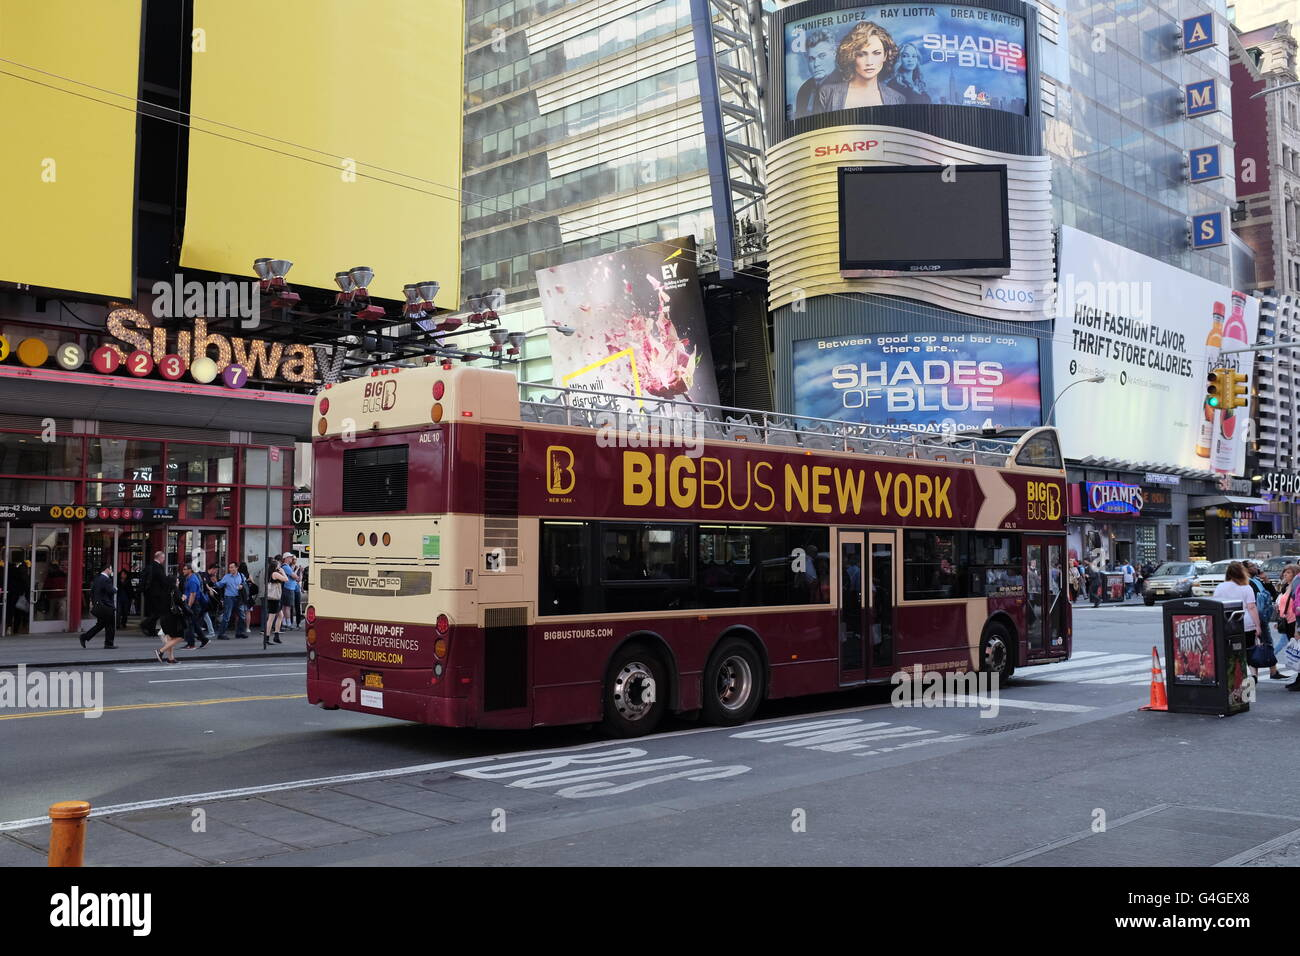 La ville de New York, Manhattan, Big Bus Photo Stock